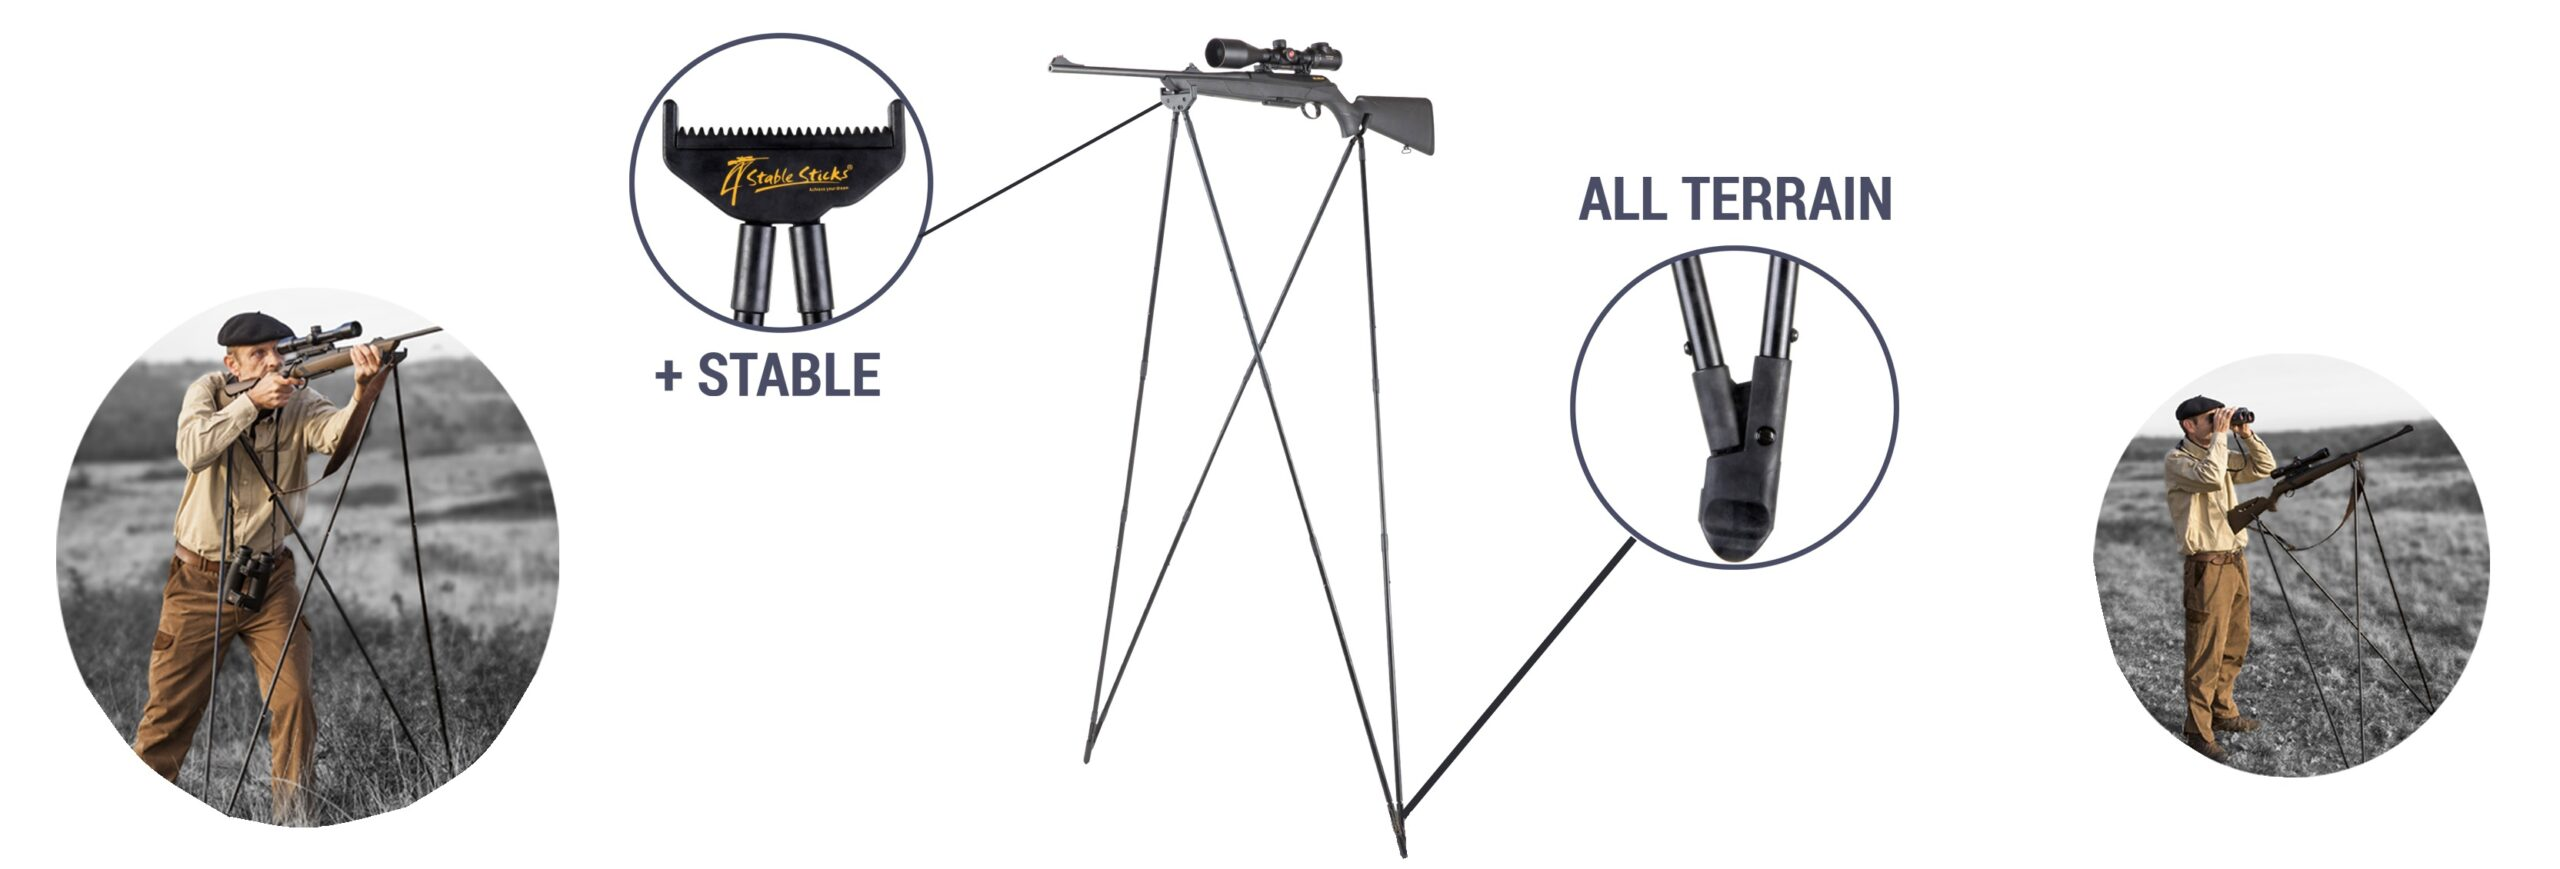 Опоры для стрельбы 4 Stable Sticks